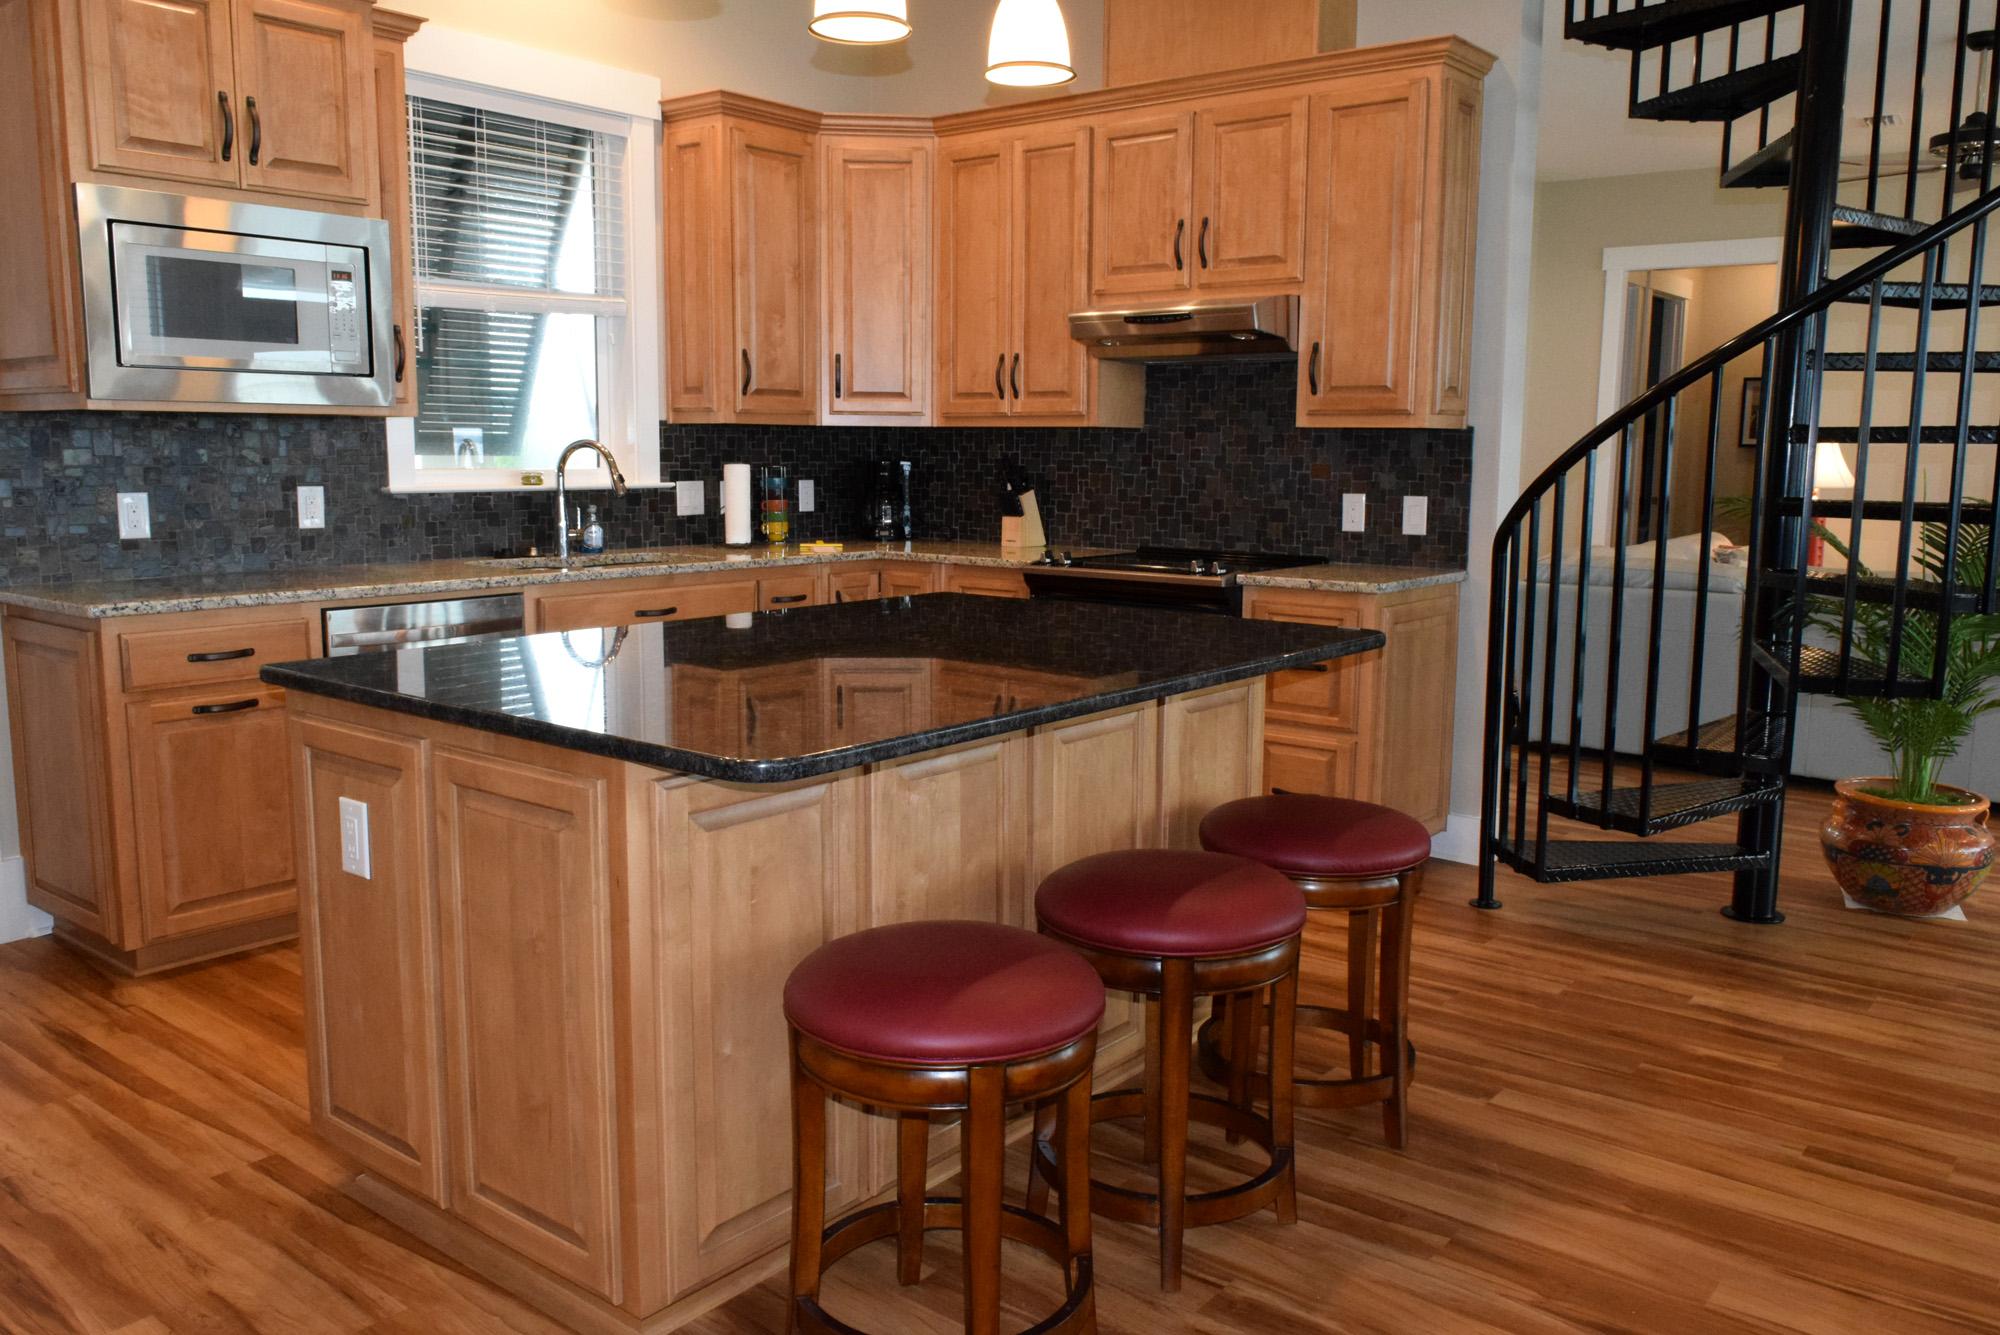 Panferio 337 House/Cottage rental in Pensacola Beach House Rentals in Pensacola Beach Florida - #11